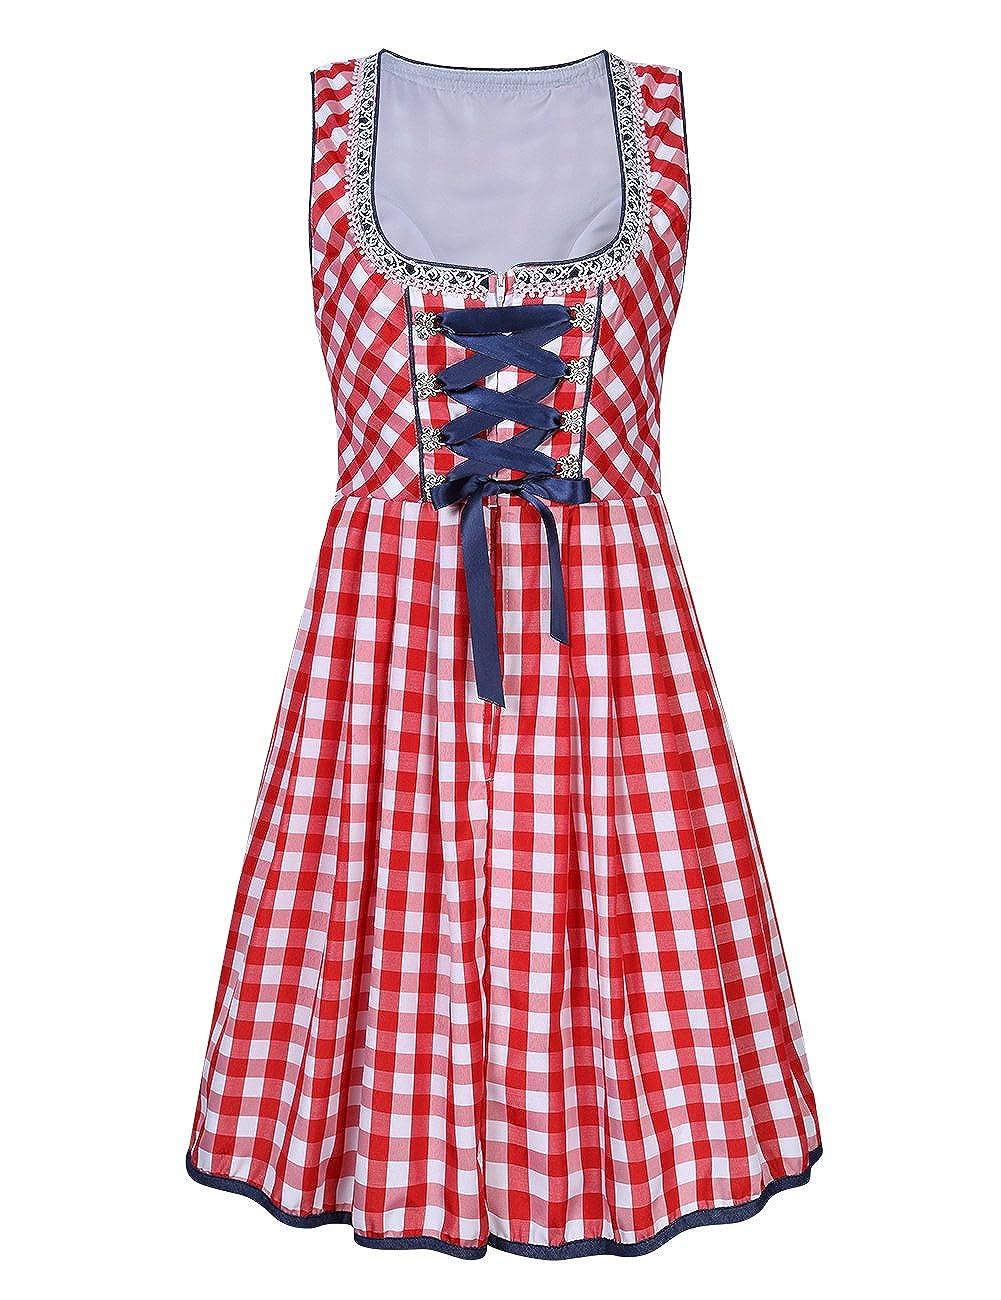 82a9d75b20dbe Pyjamasques Garçon Tee-shirt manches longues - rouge 167205-RED ...